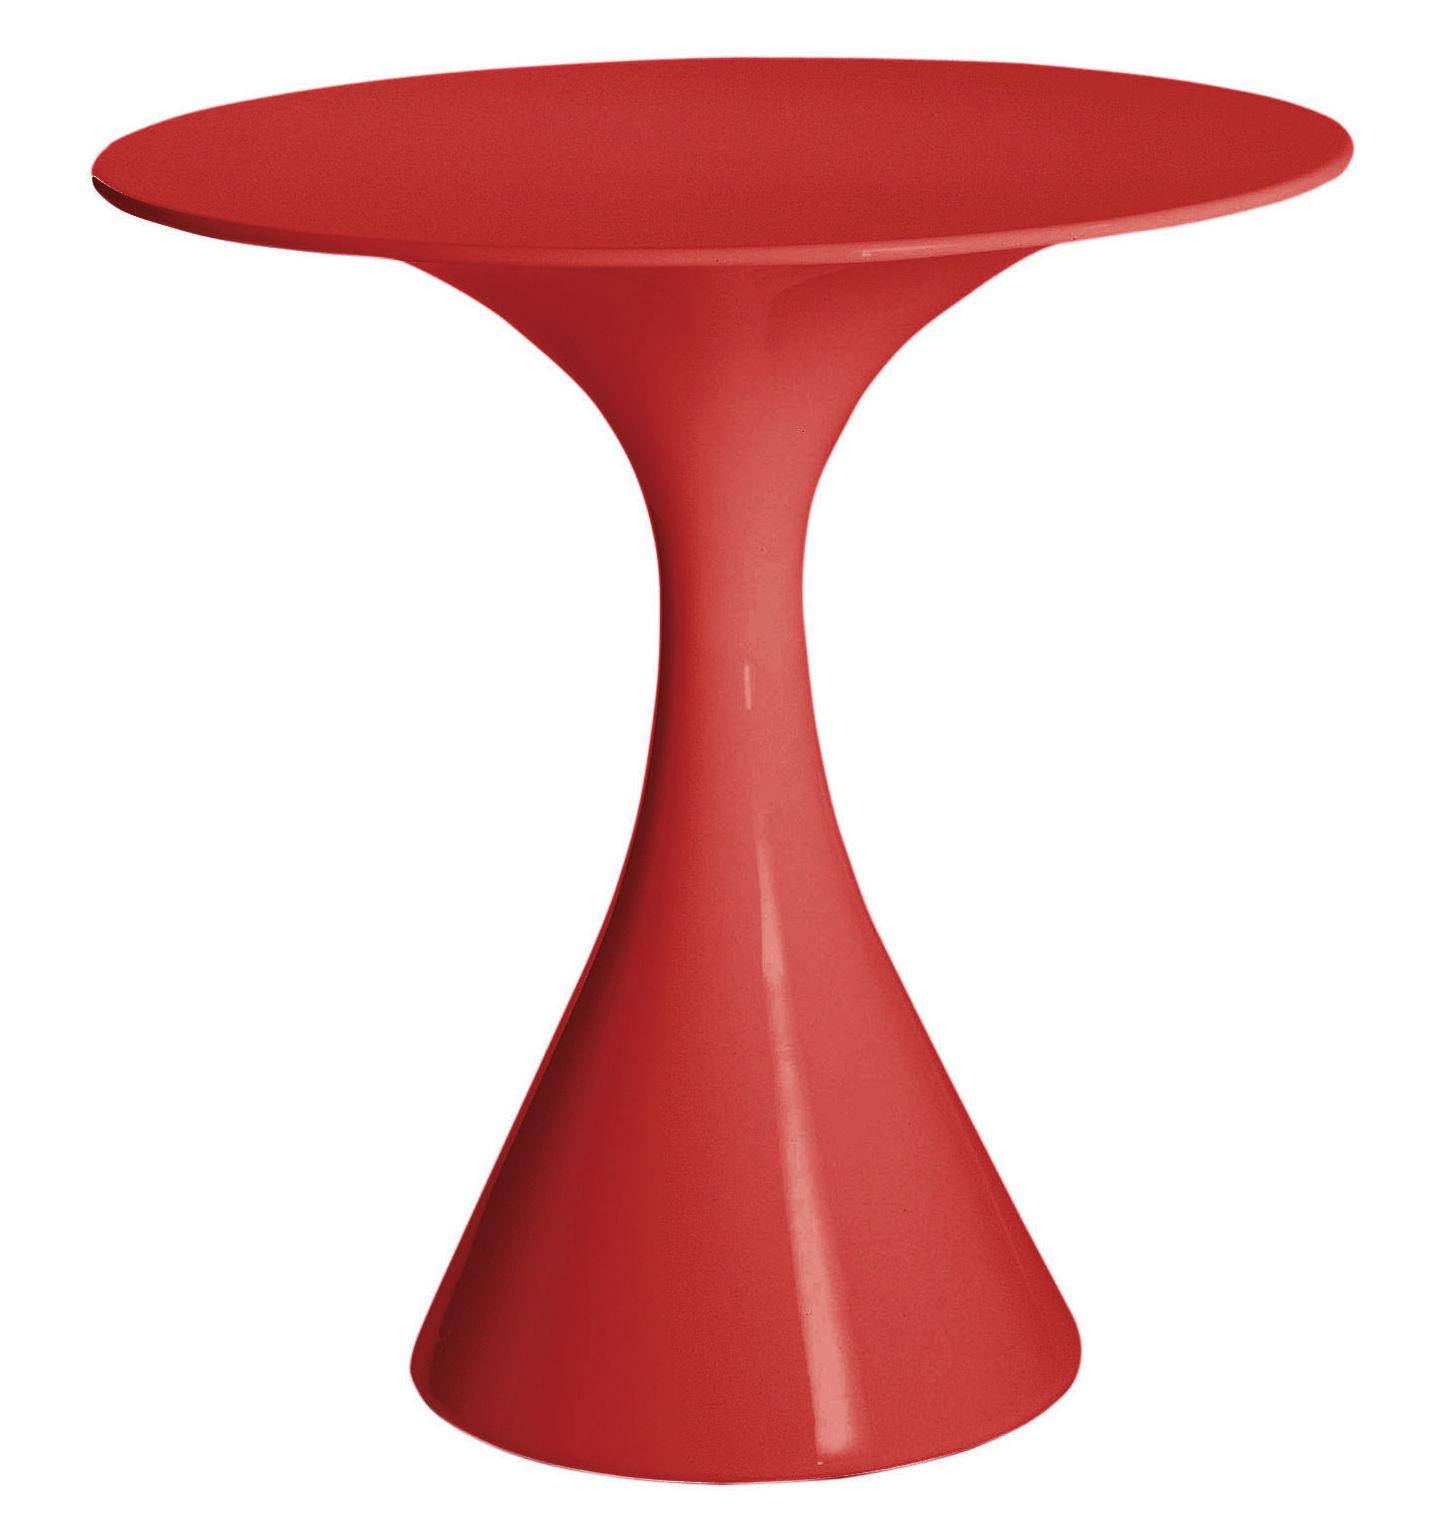 Jardin - Tables de jardin - Table de jardin Kissi Kissi - Driade - Rouge - Polyéthylène